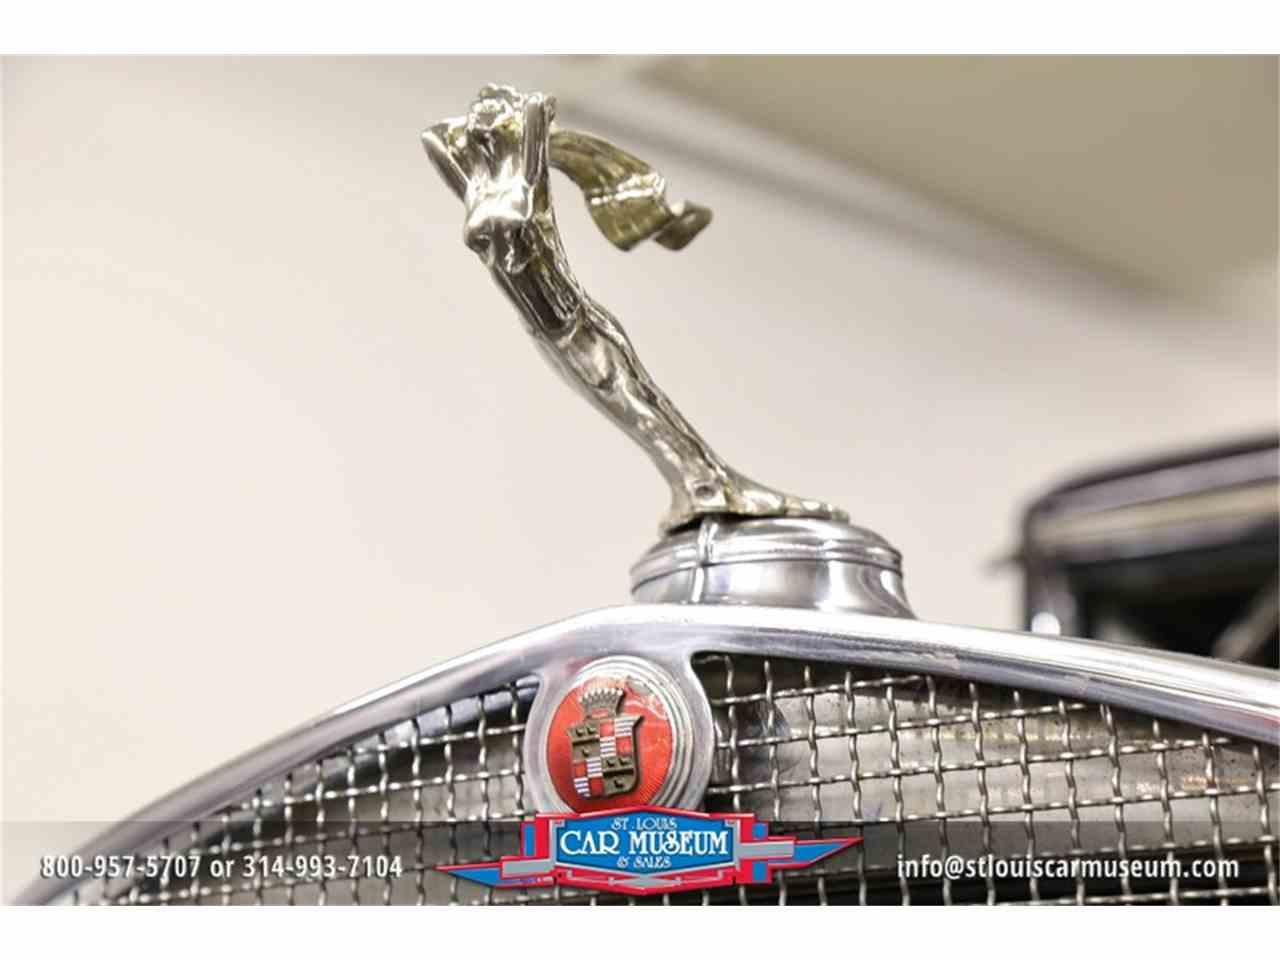 Large Picture of '31 Cadillac V-16 Madam X Landau Sedan Offered by St. Louis Car Museum - JSU3